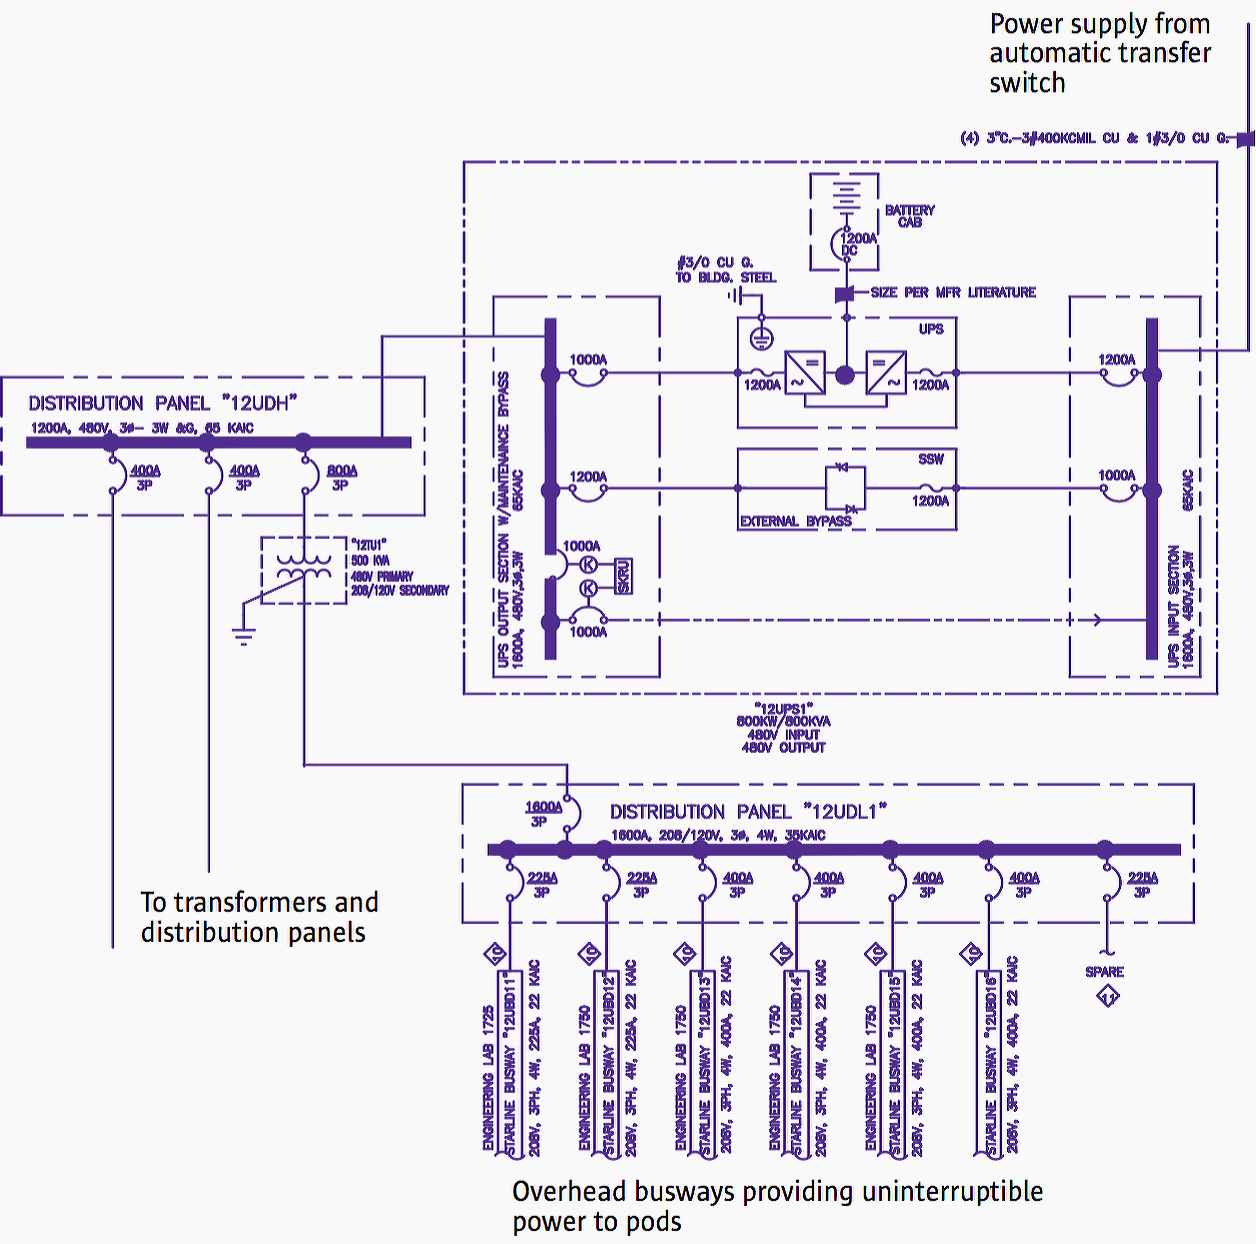 single line diagram of power distribution 1963 impala turn signal wiring electrical design sun 39s datacenter in santa clara